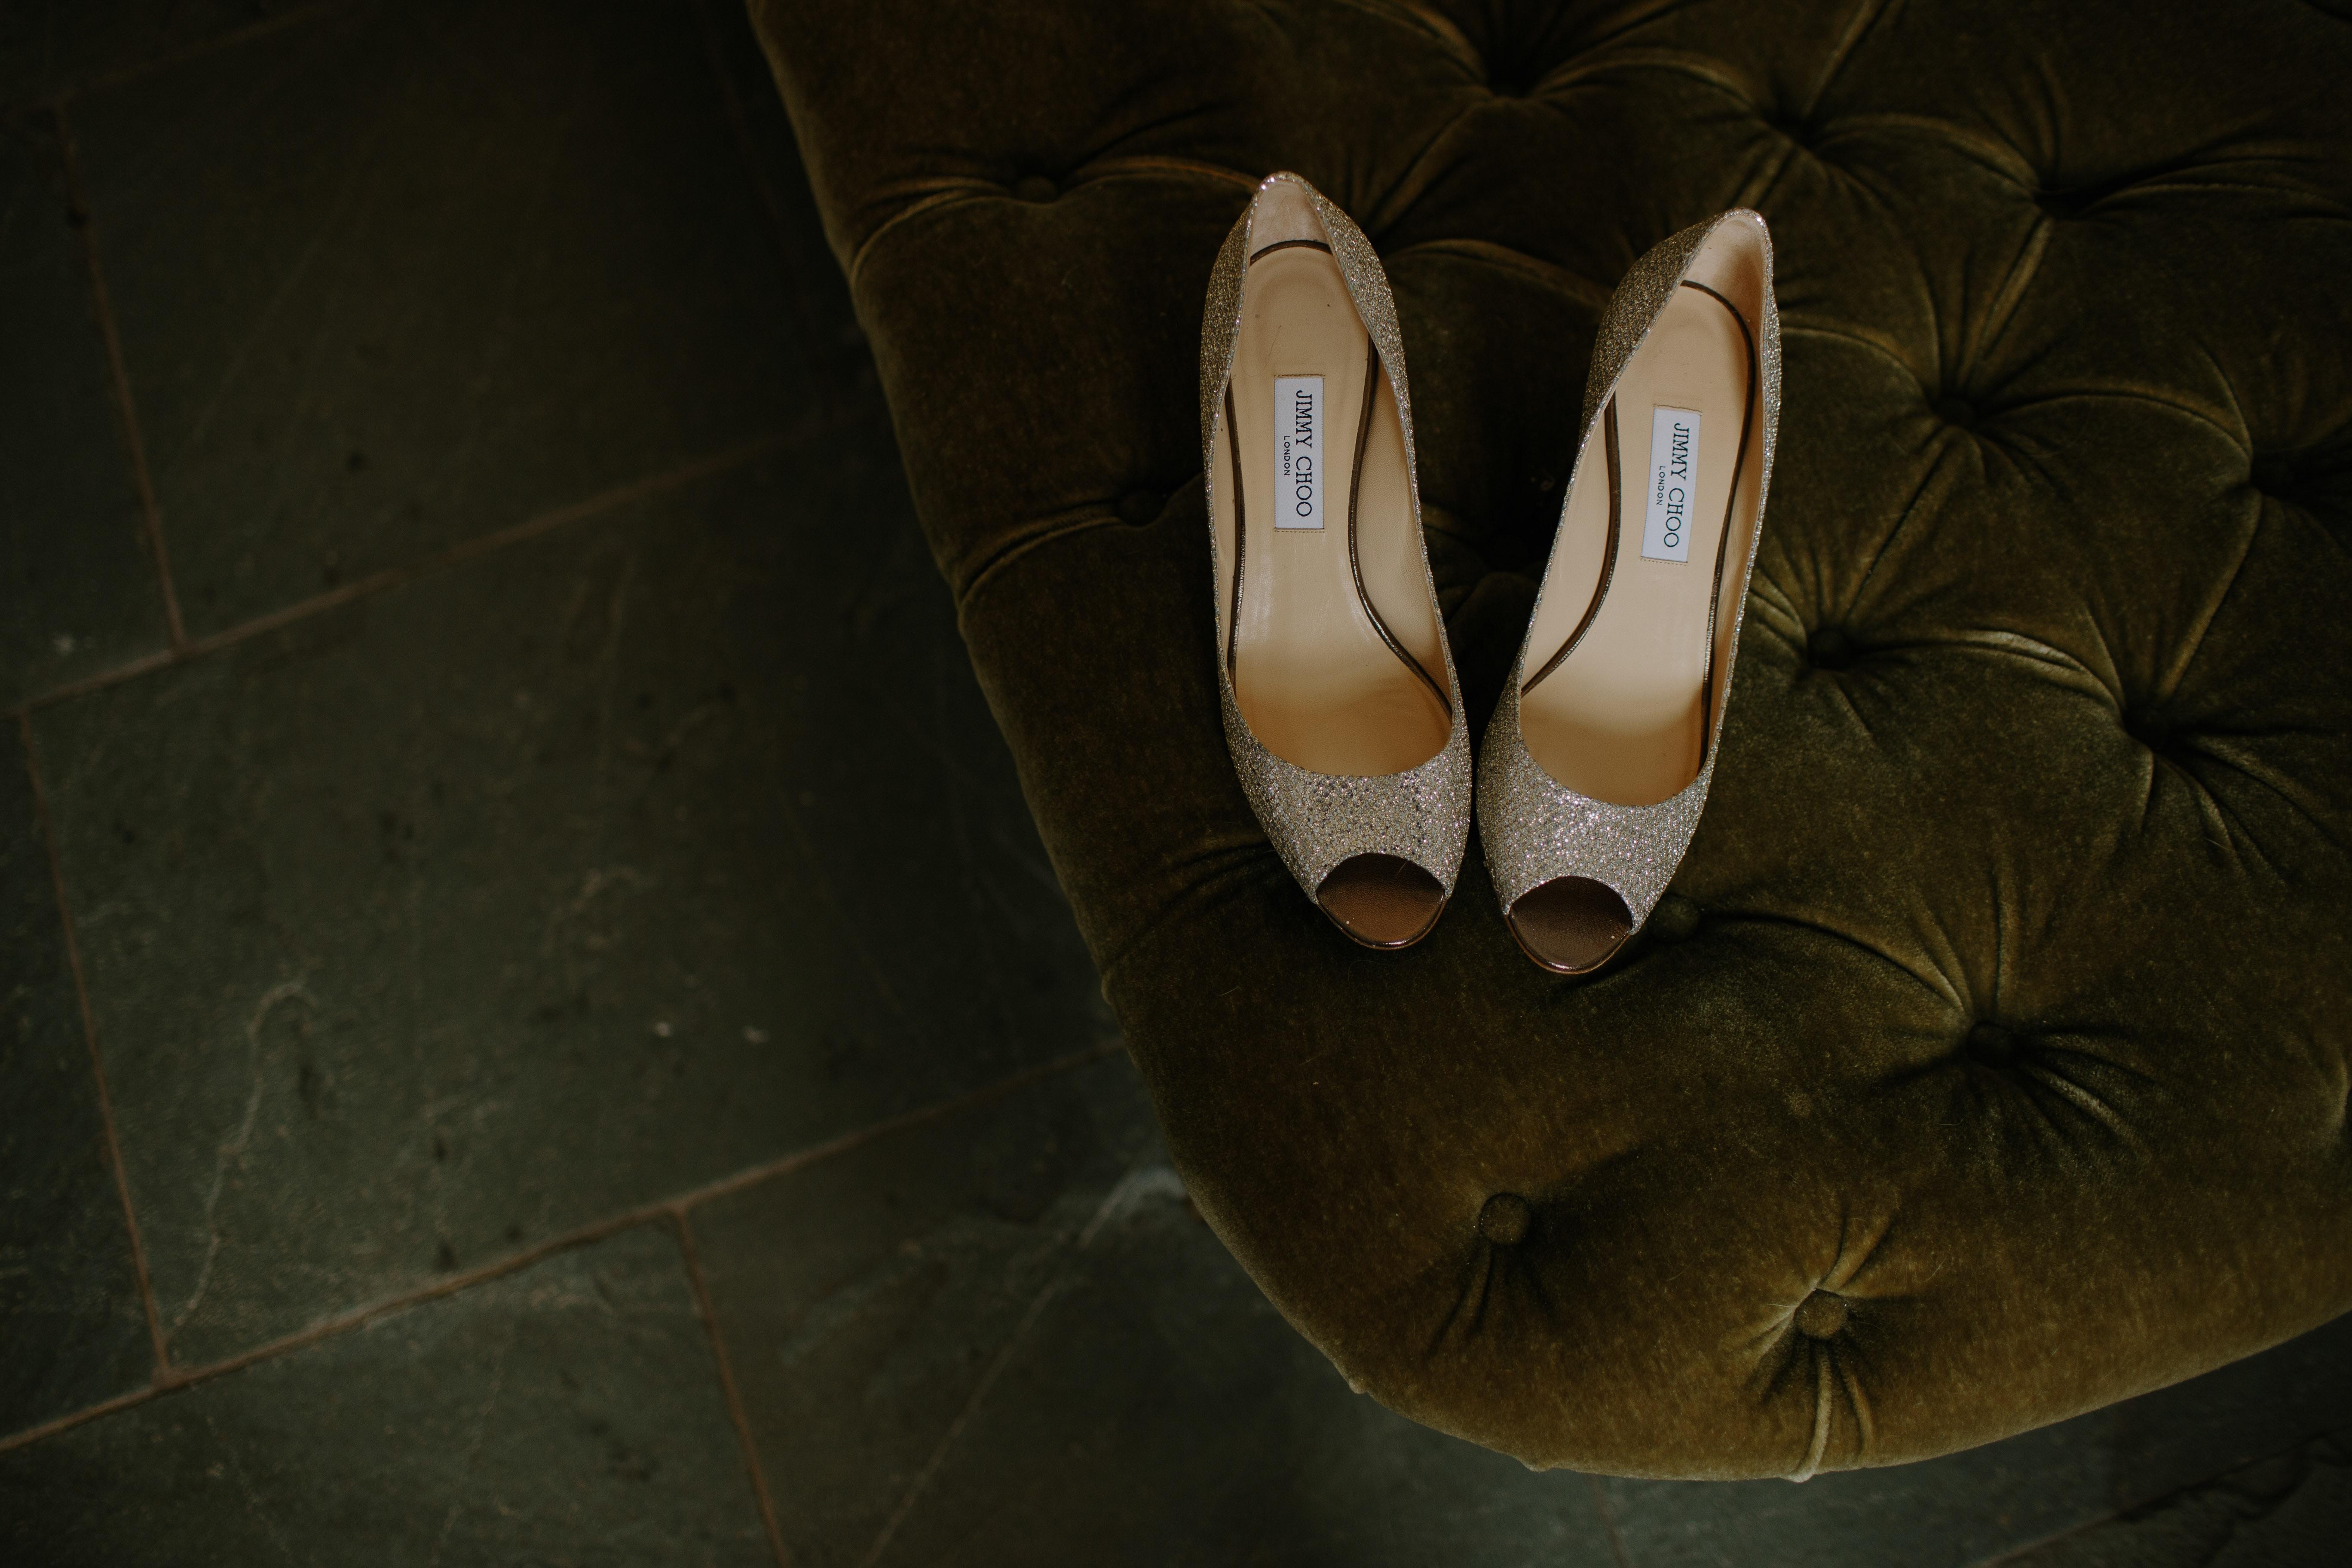 Luxury wedding shoes, Jimmy Choo wedding shoes, luxury wedding planning